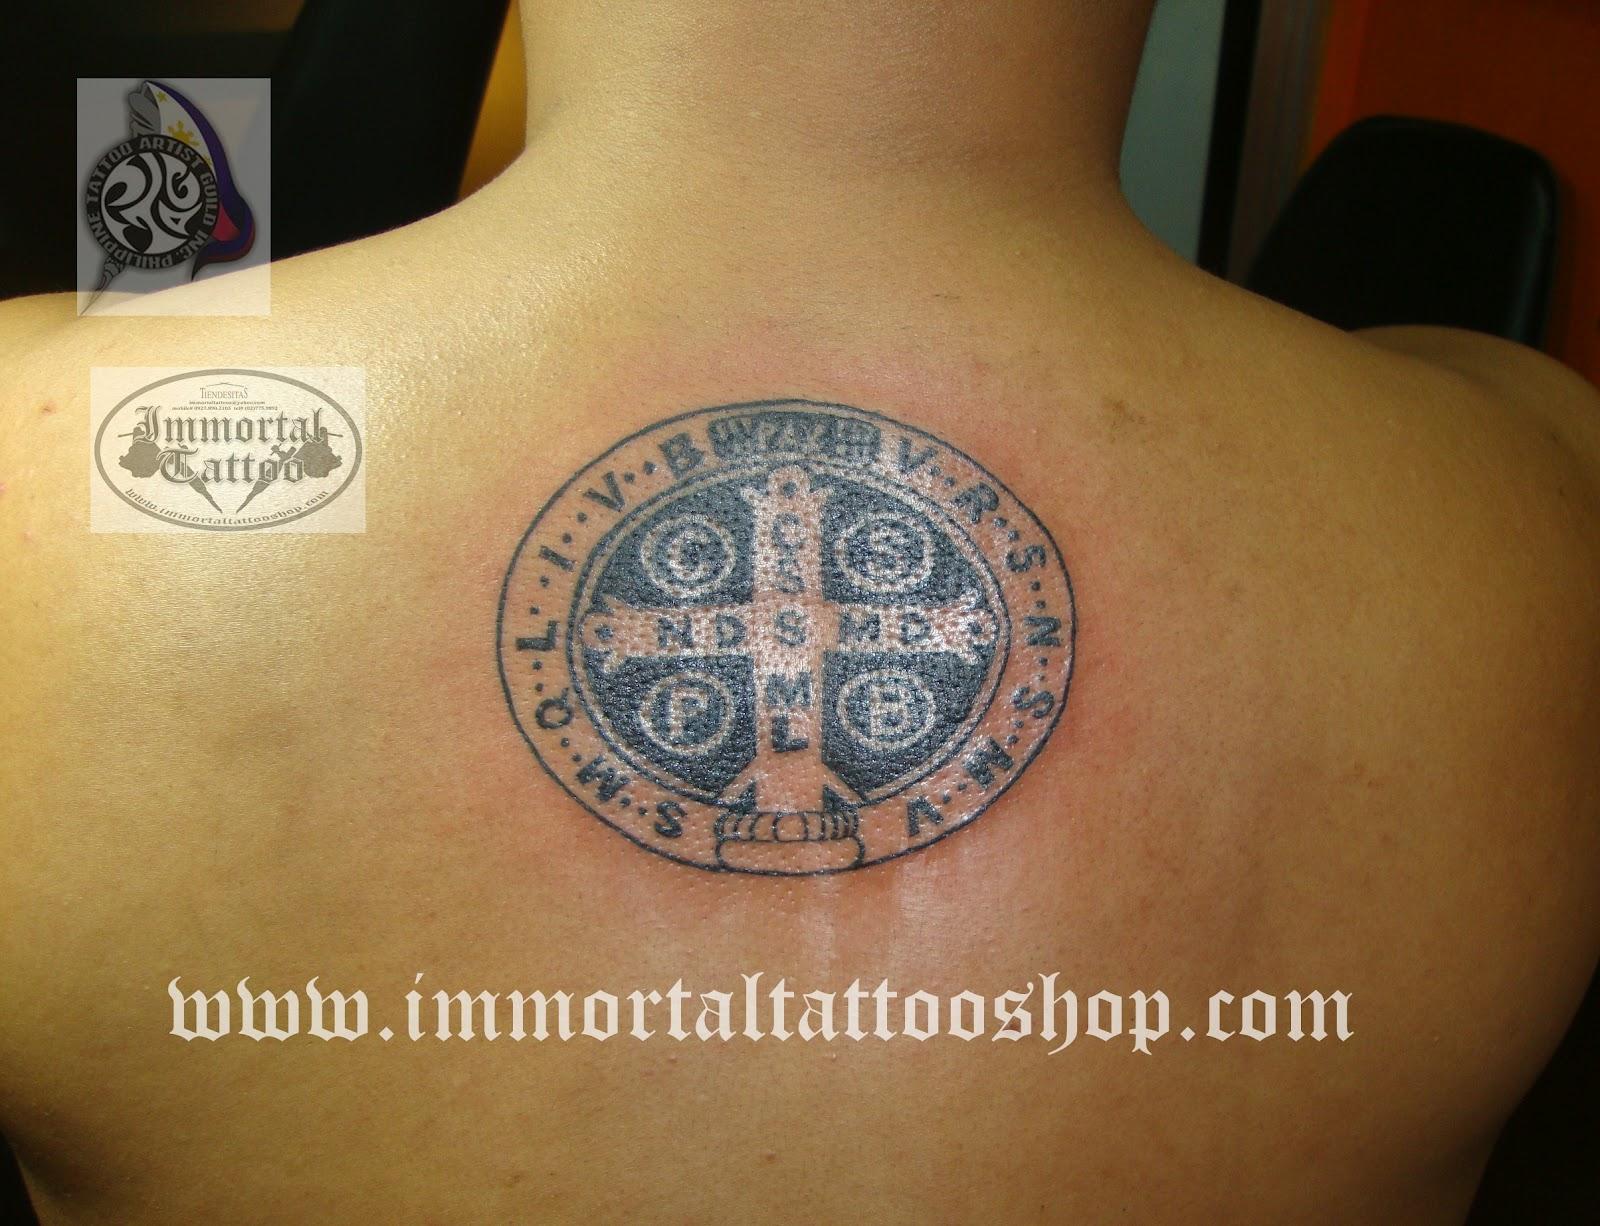 immortal tattoo manila philippines by frank ibanez jr saint benedict tattoo medal tattoo. Black Bedroom Furniture Sets. Home Design Ideas